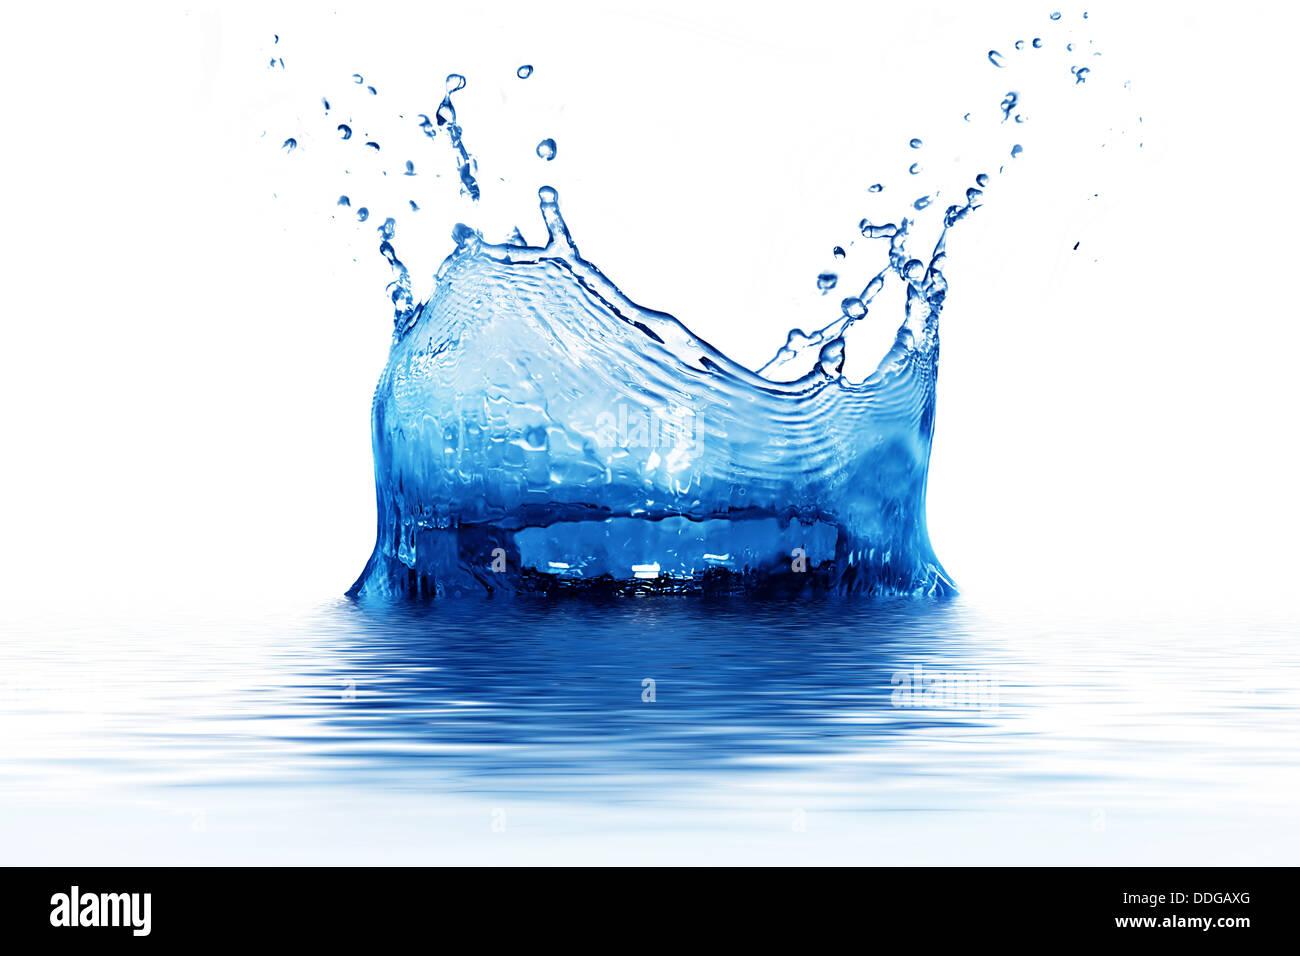 Water splash - Stock Image